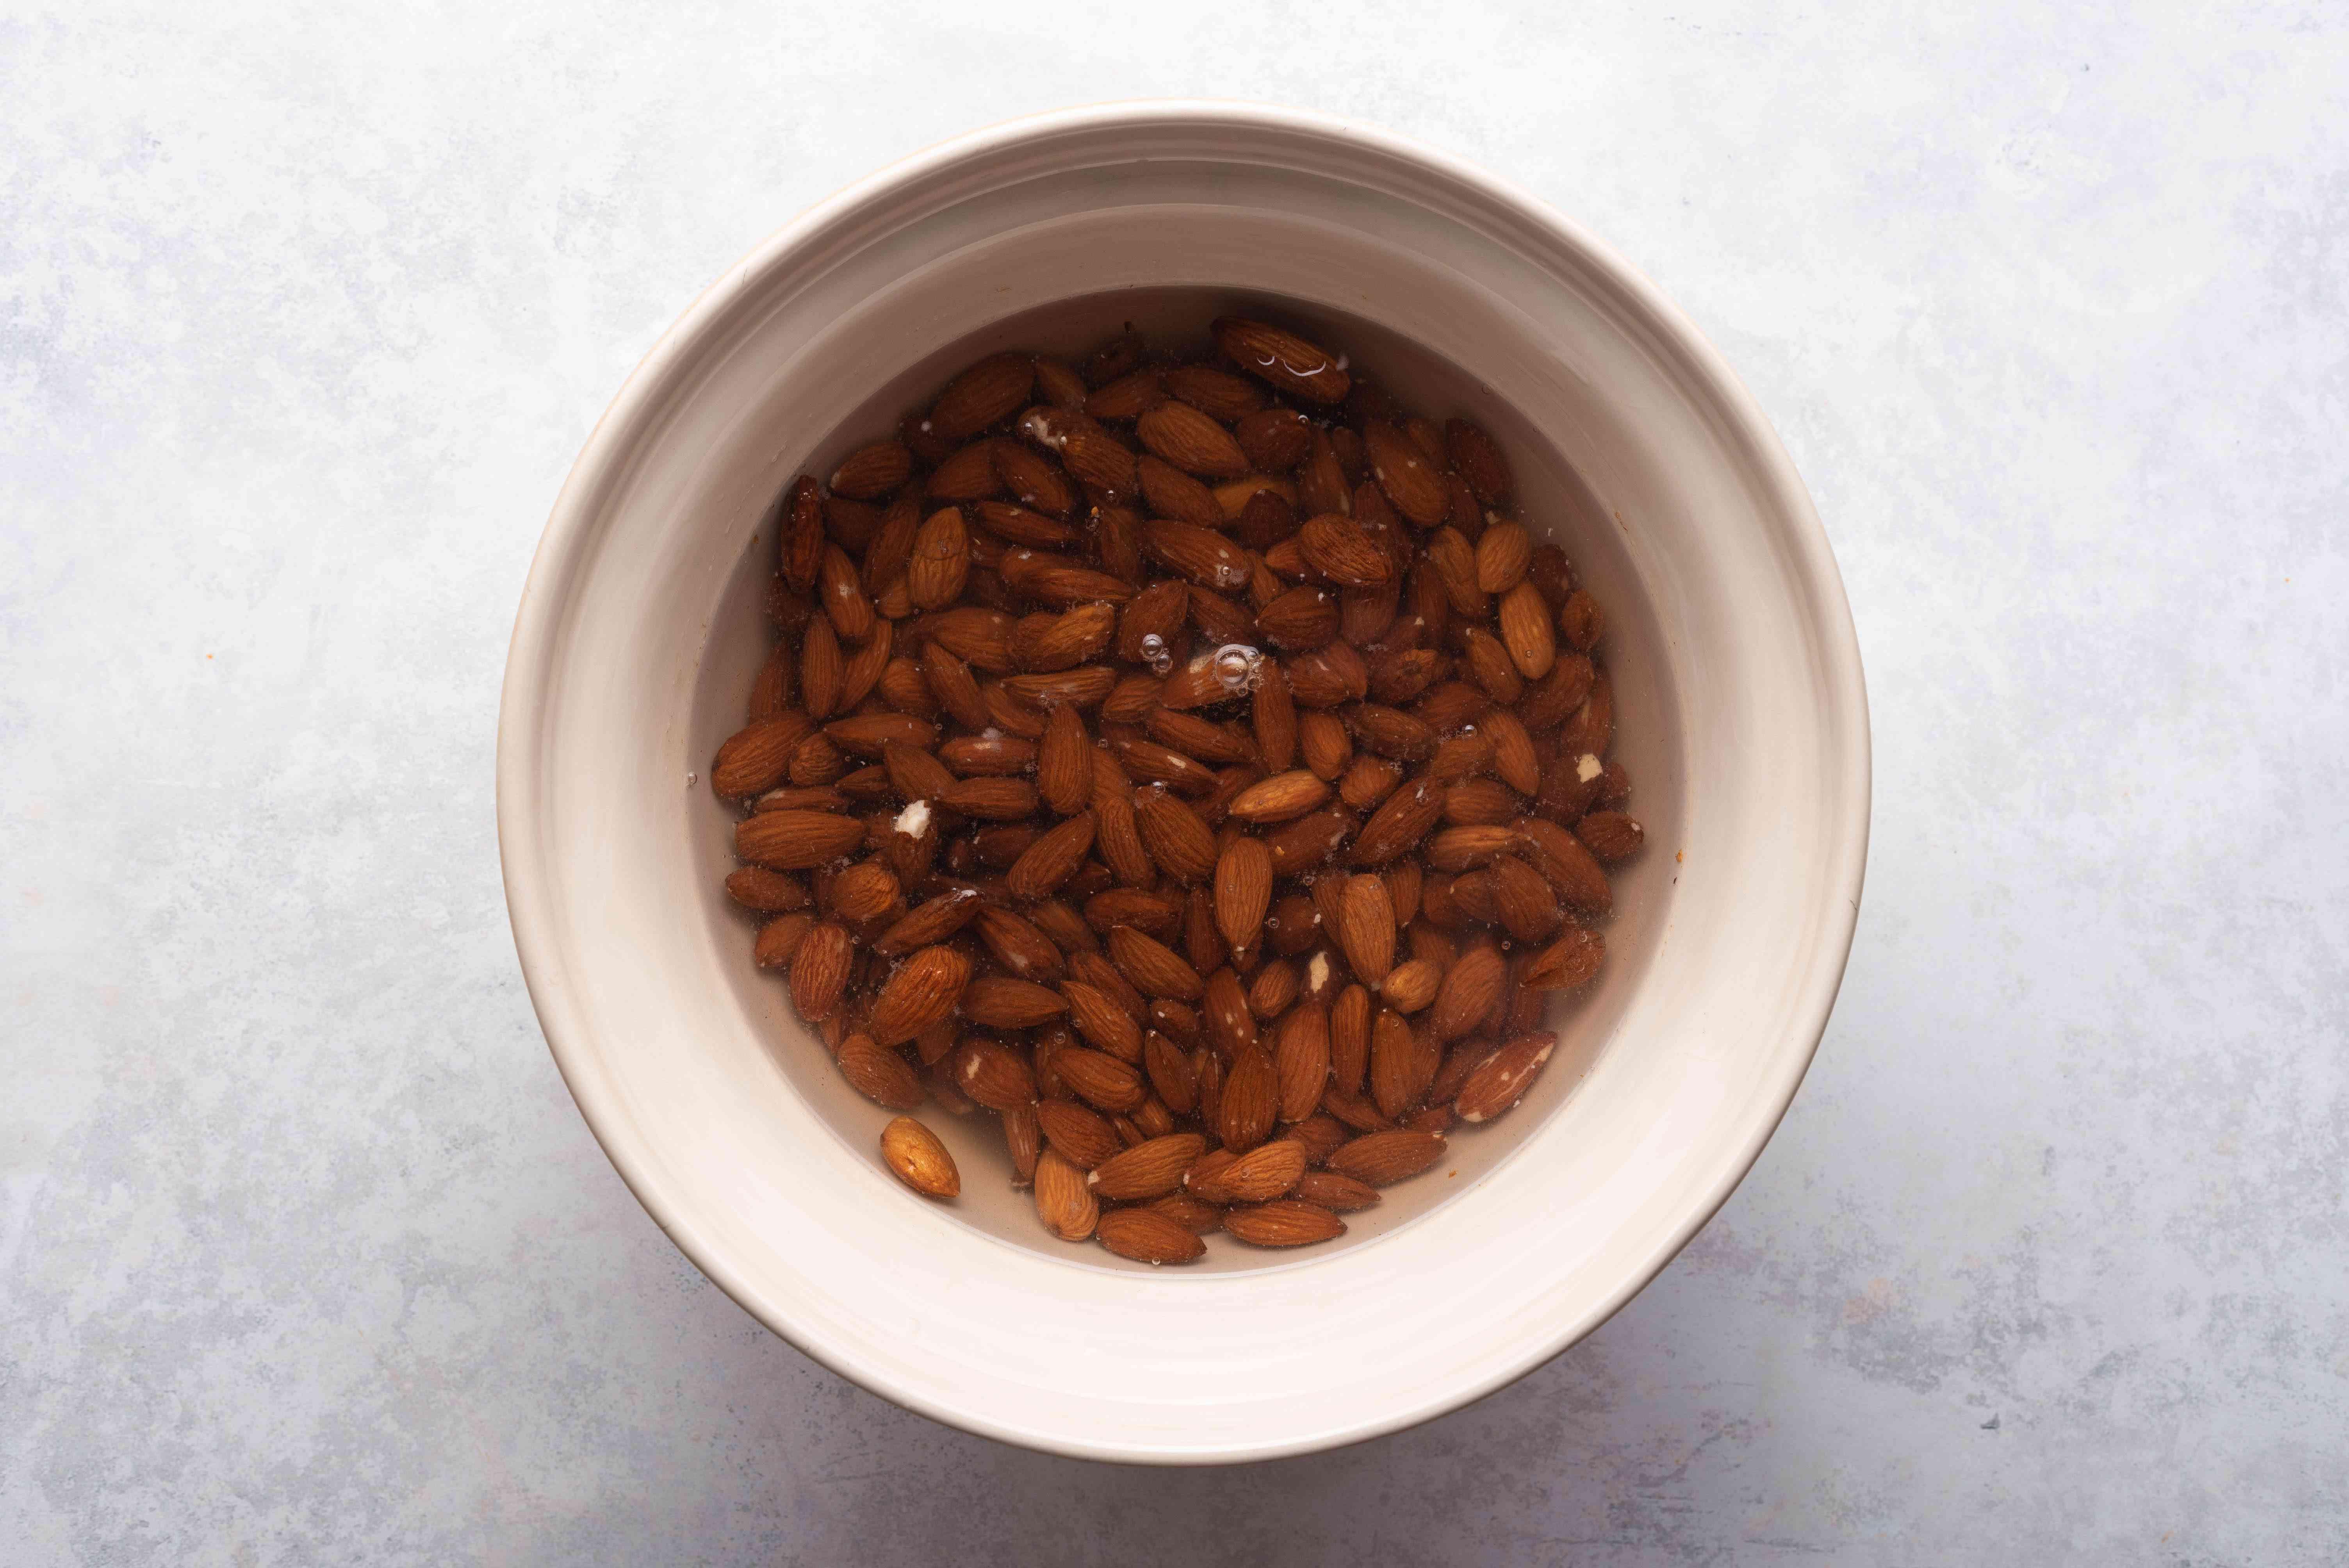 almonds soaking in a bowl